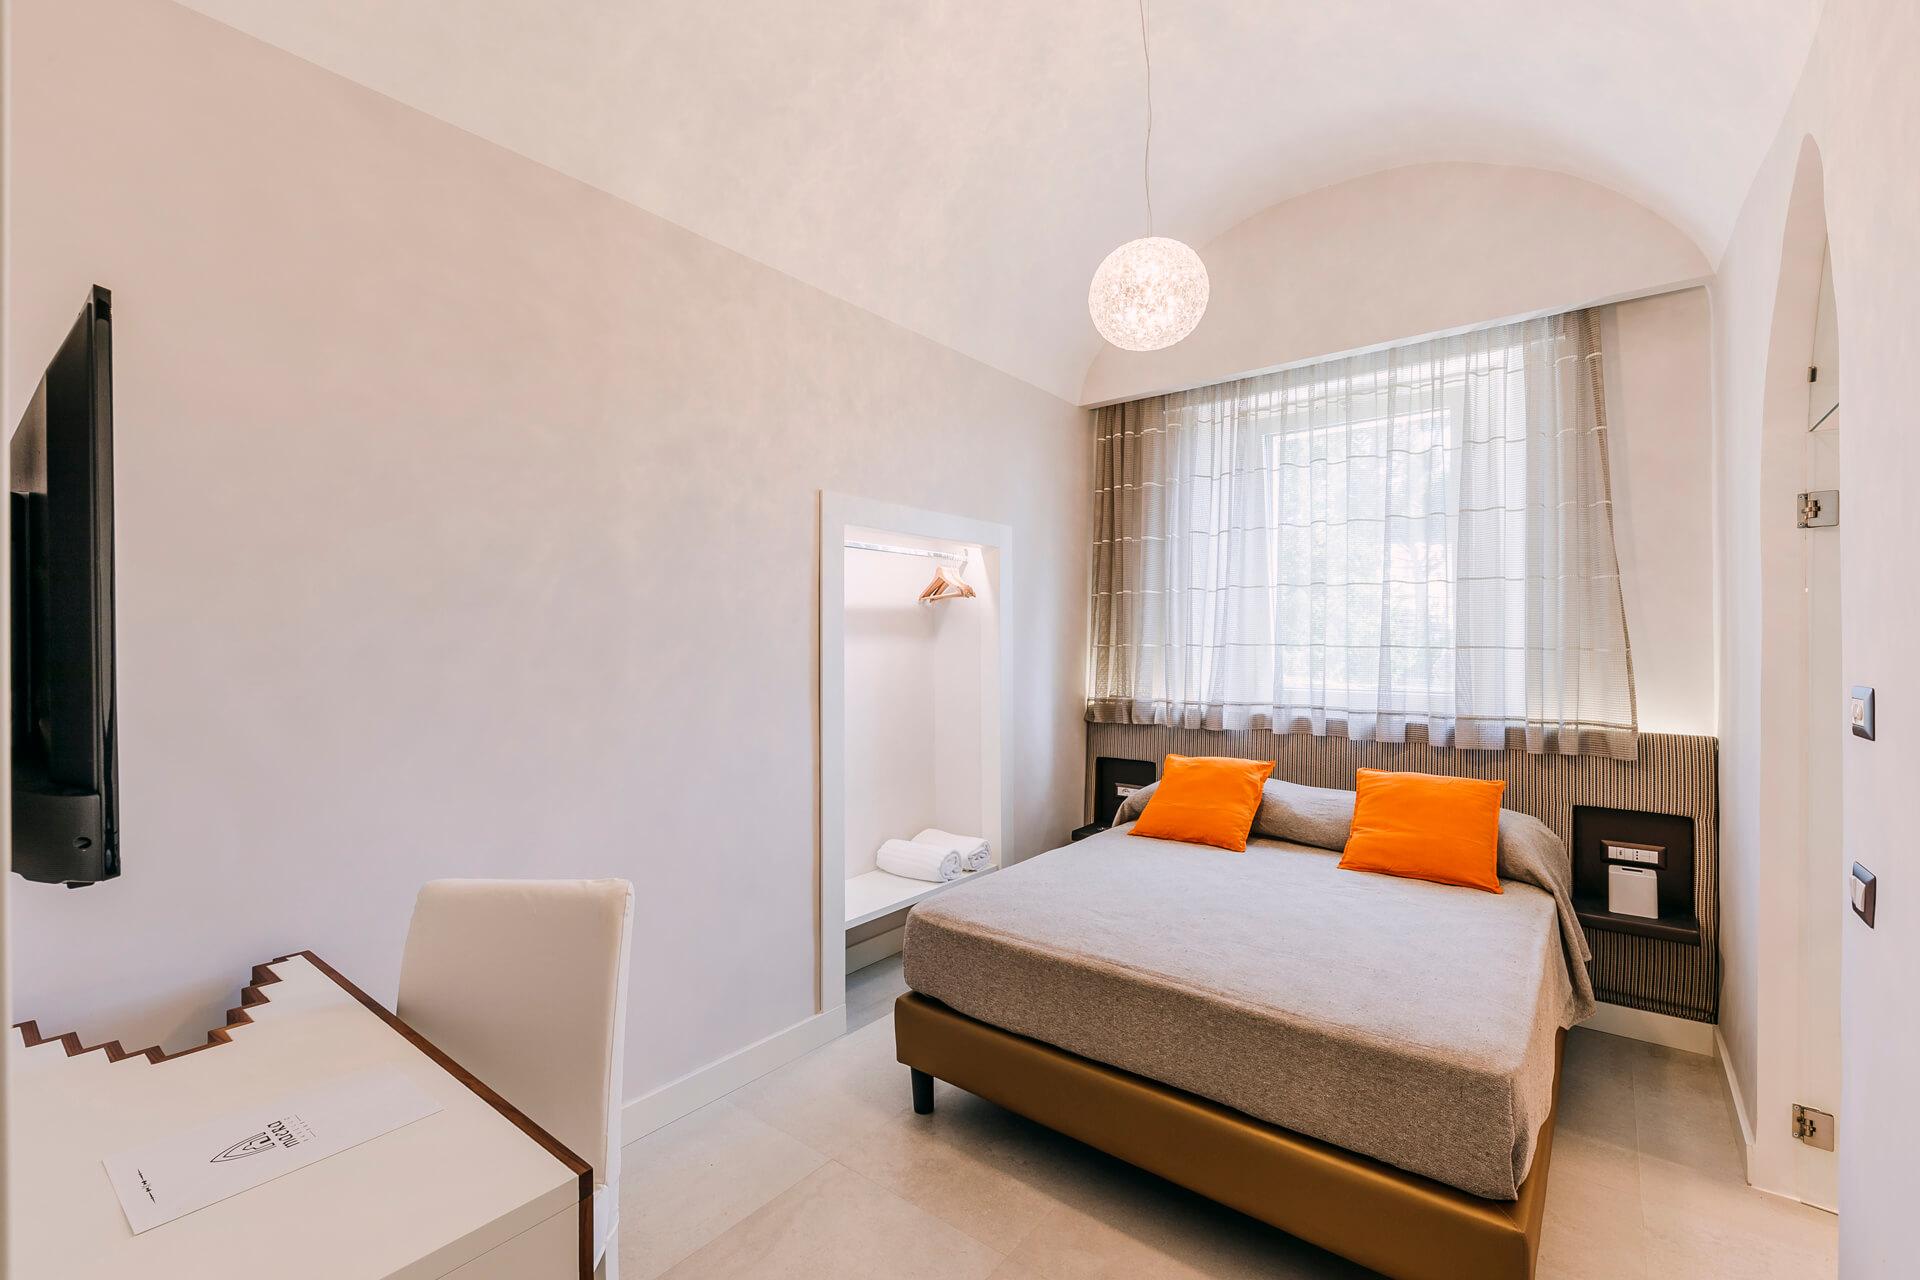 Bed and Breakfast on the Amalfi Coast